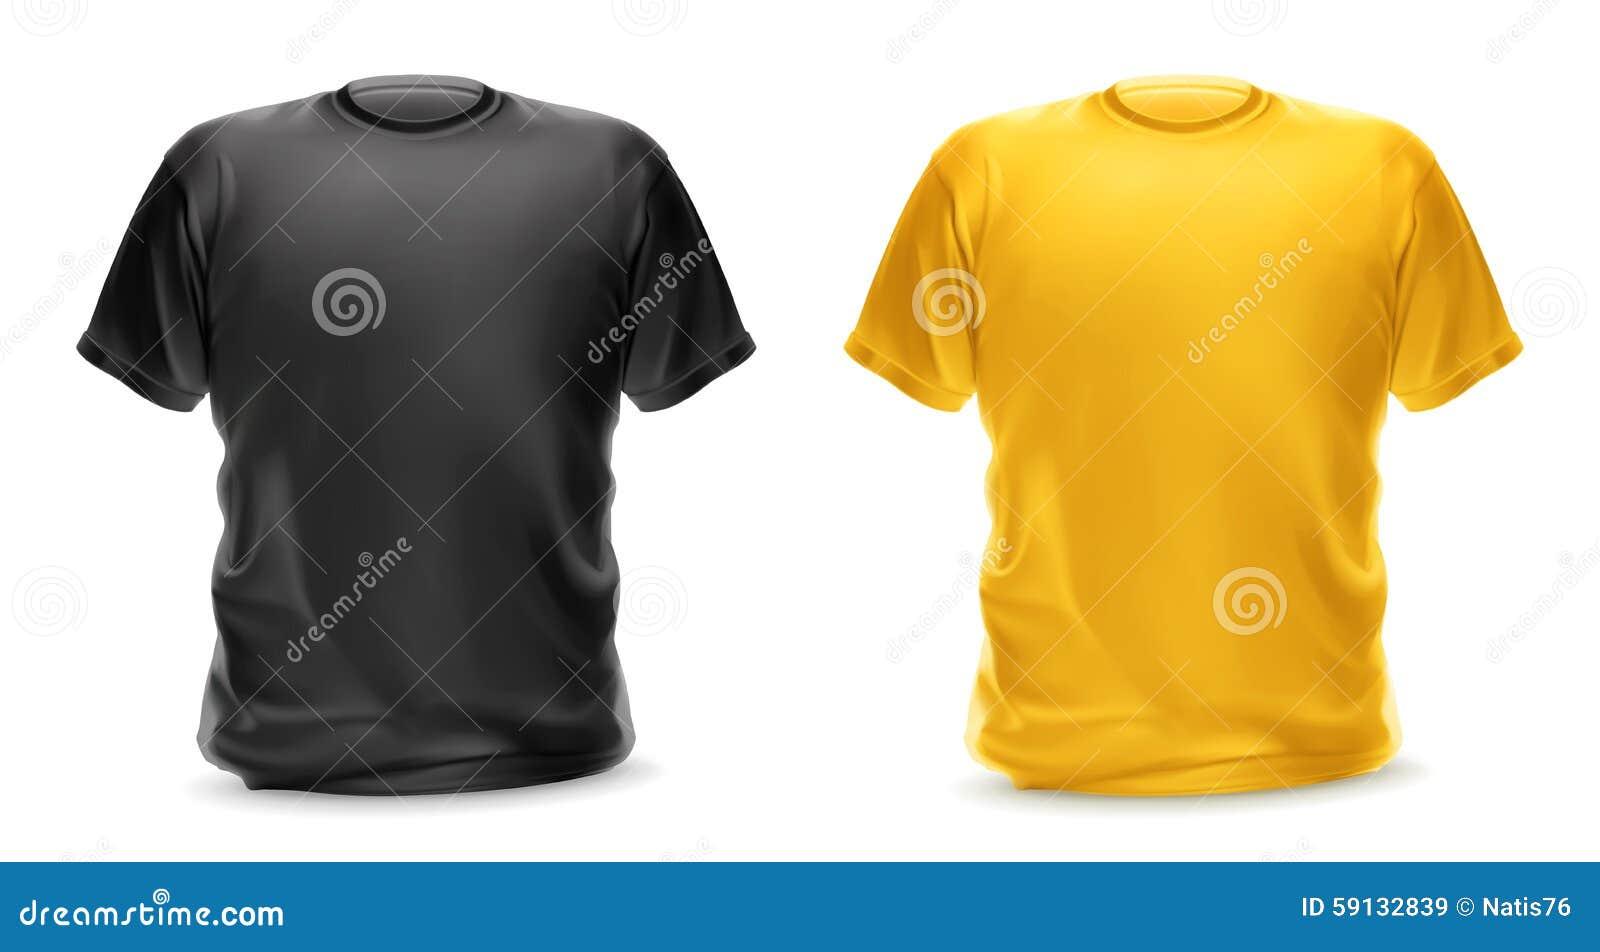 29dabec9cf58 Μαύρες και κίτρινες μπλούζες Διανυσματική απεικόνιση - εικονογραφία ...